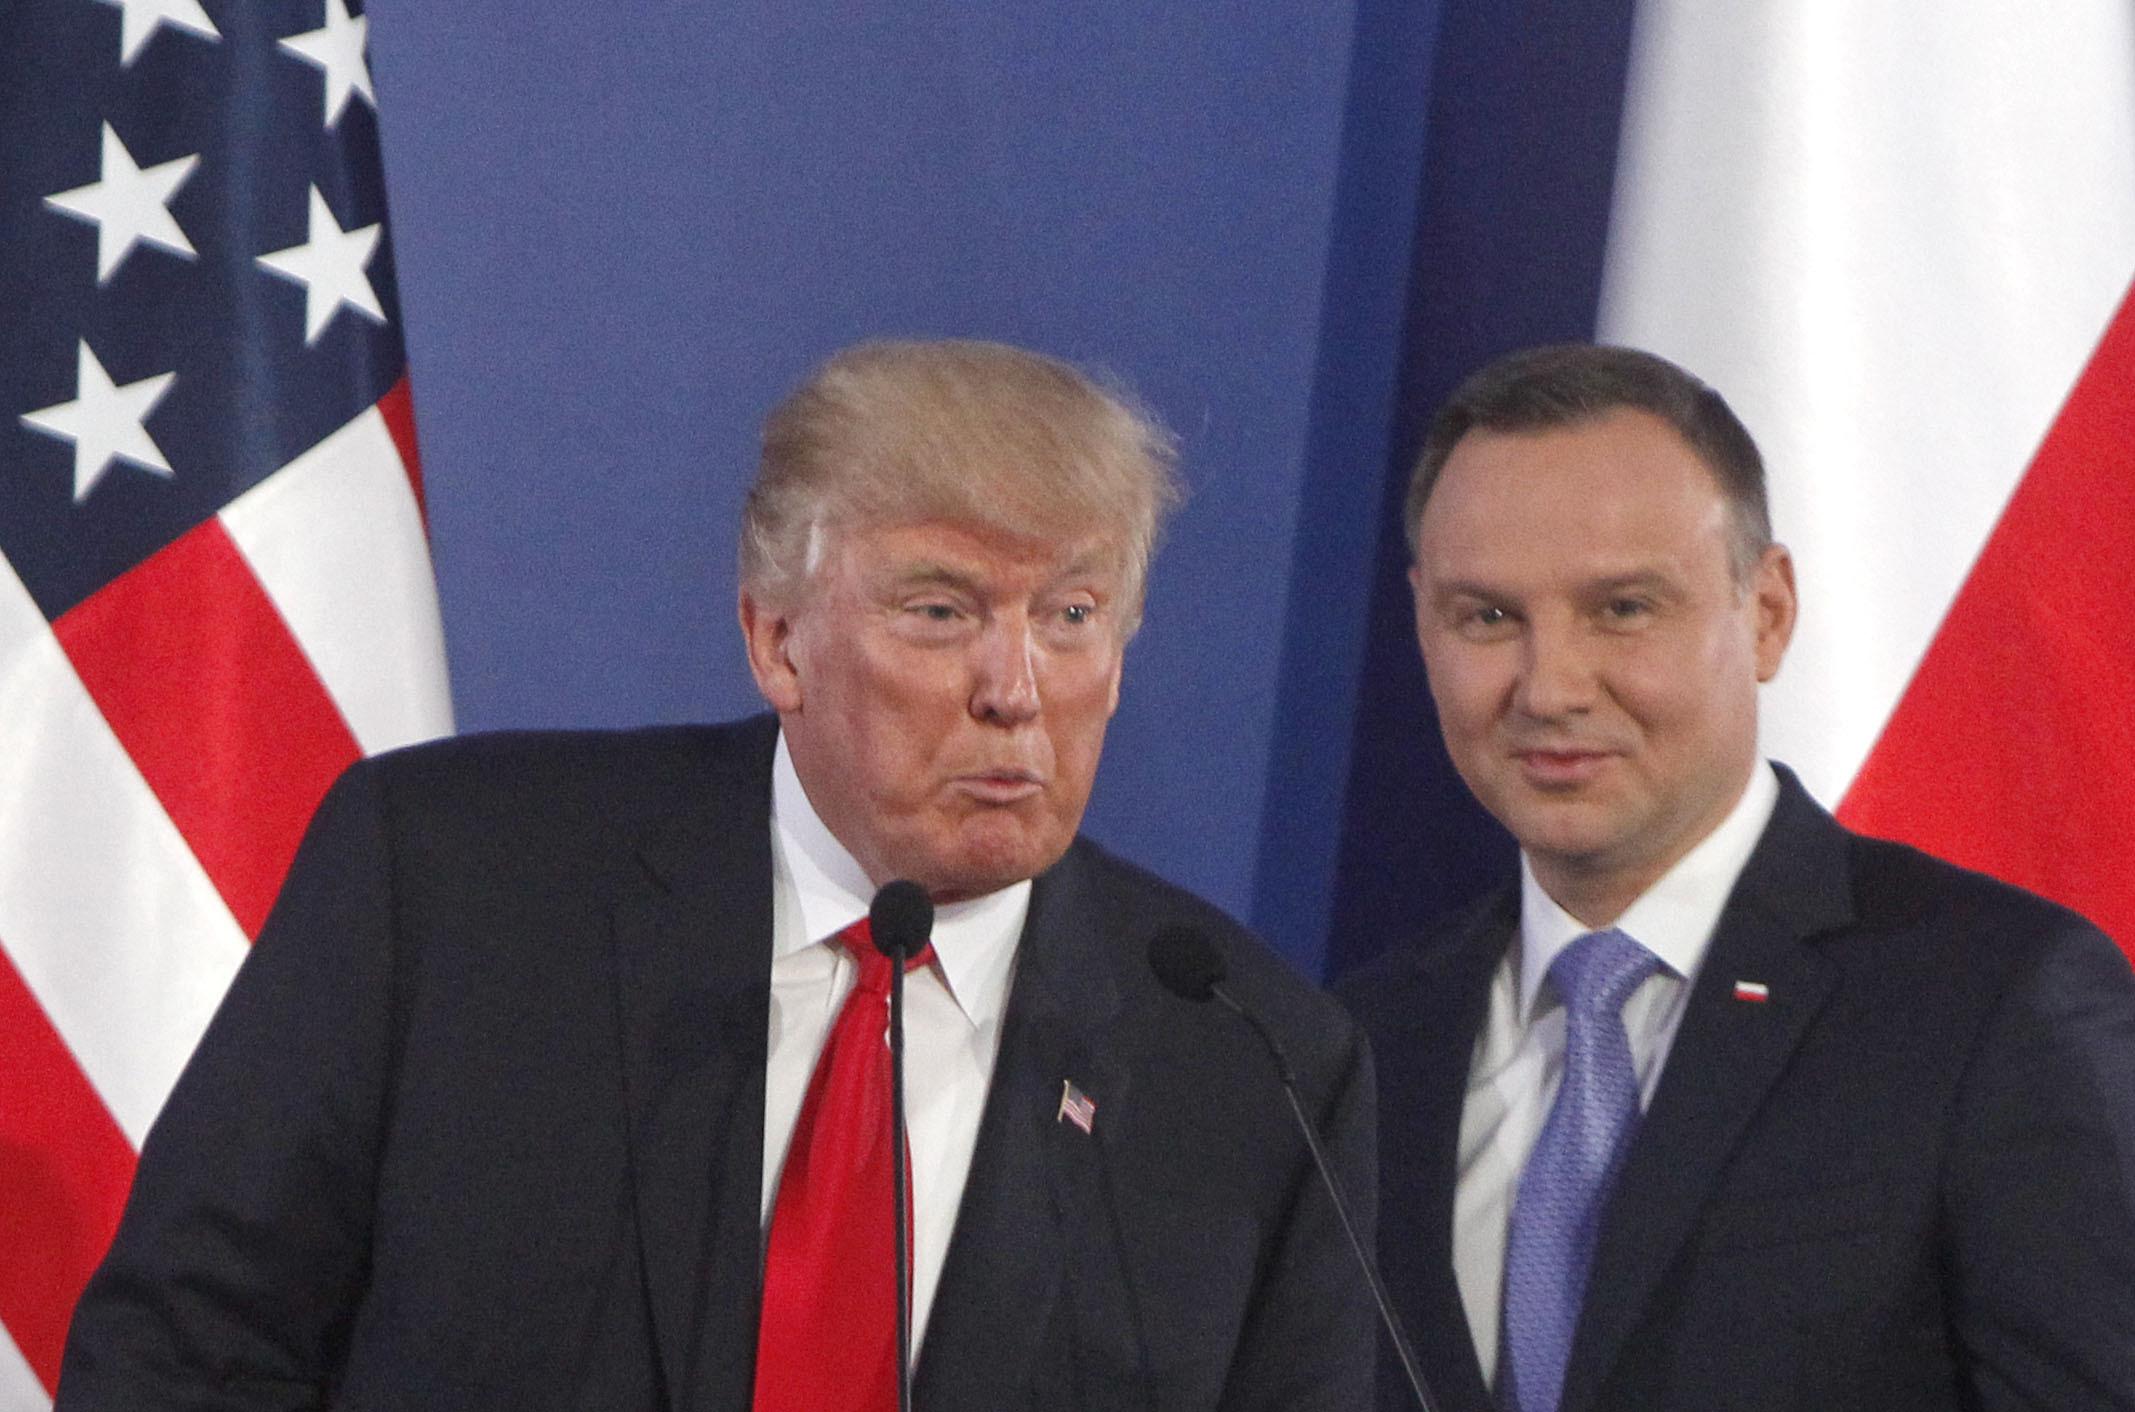 Donald Trump, Andrzej Duda